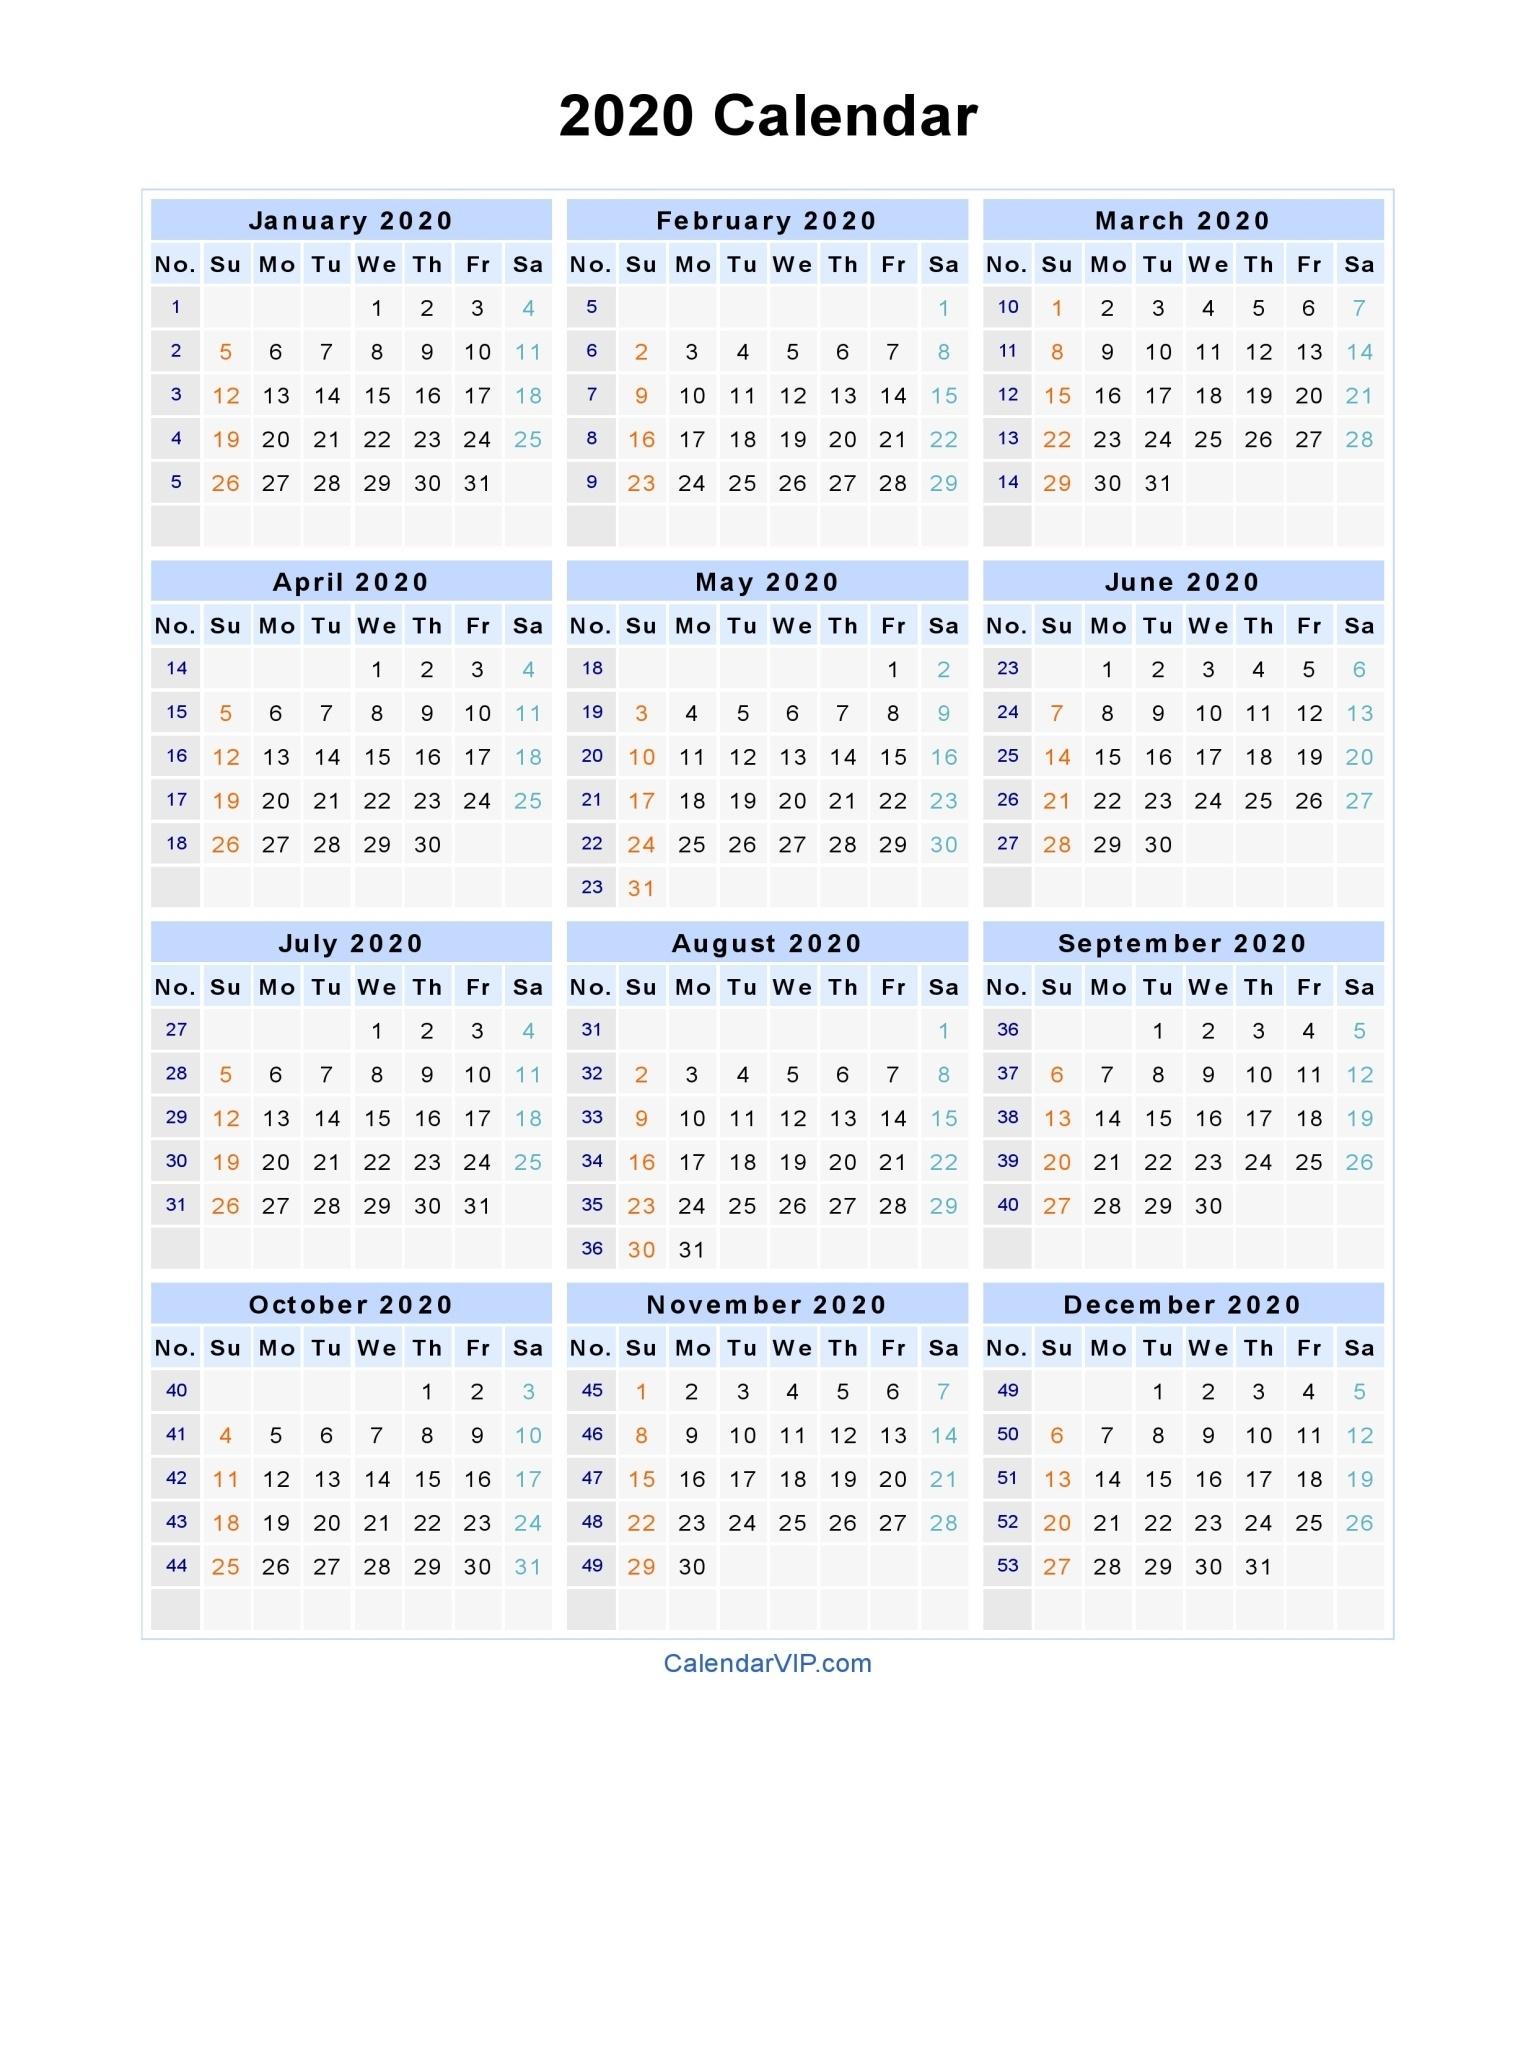 2020 Calendar - Blank Printable Calendar Template In Pdf Word Excel_2020 Calendar Blank Excel